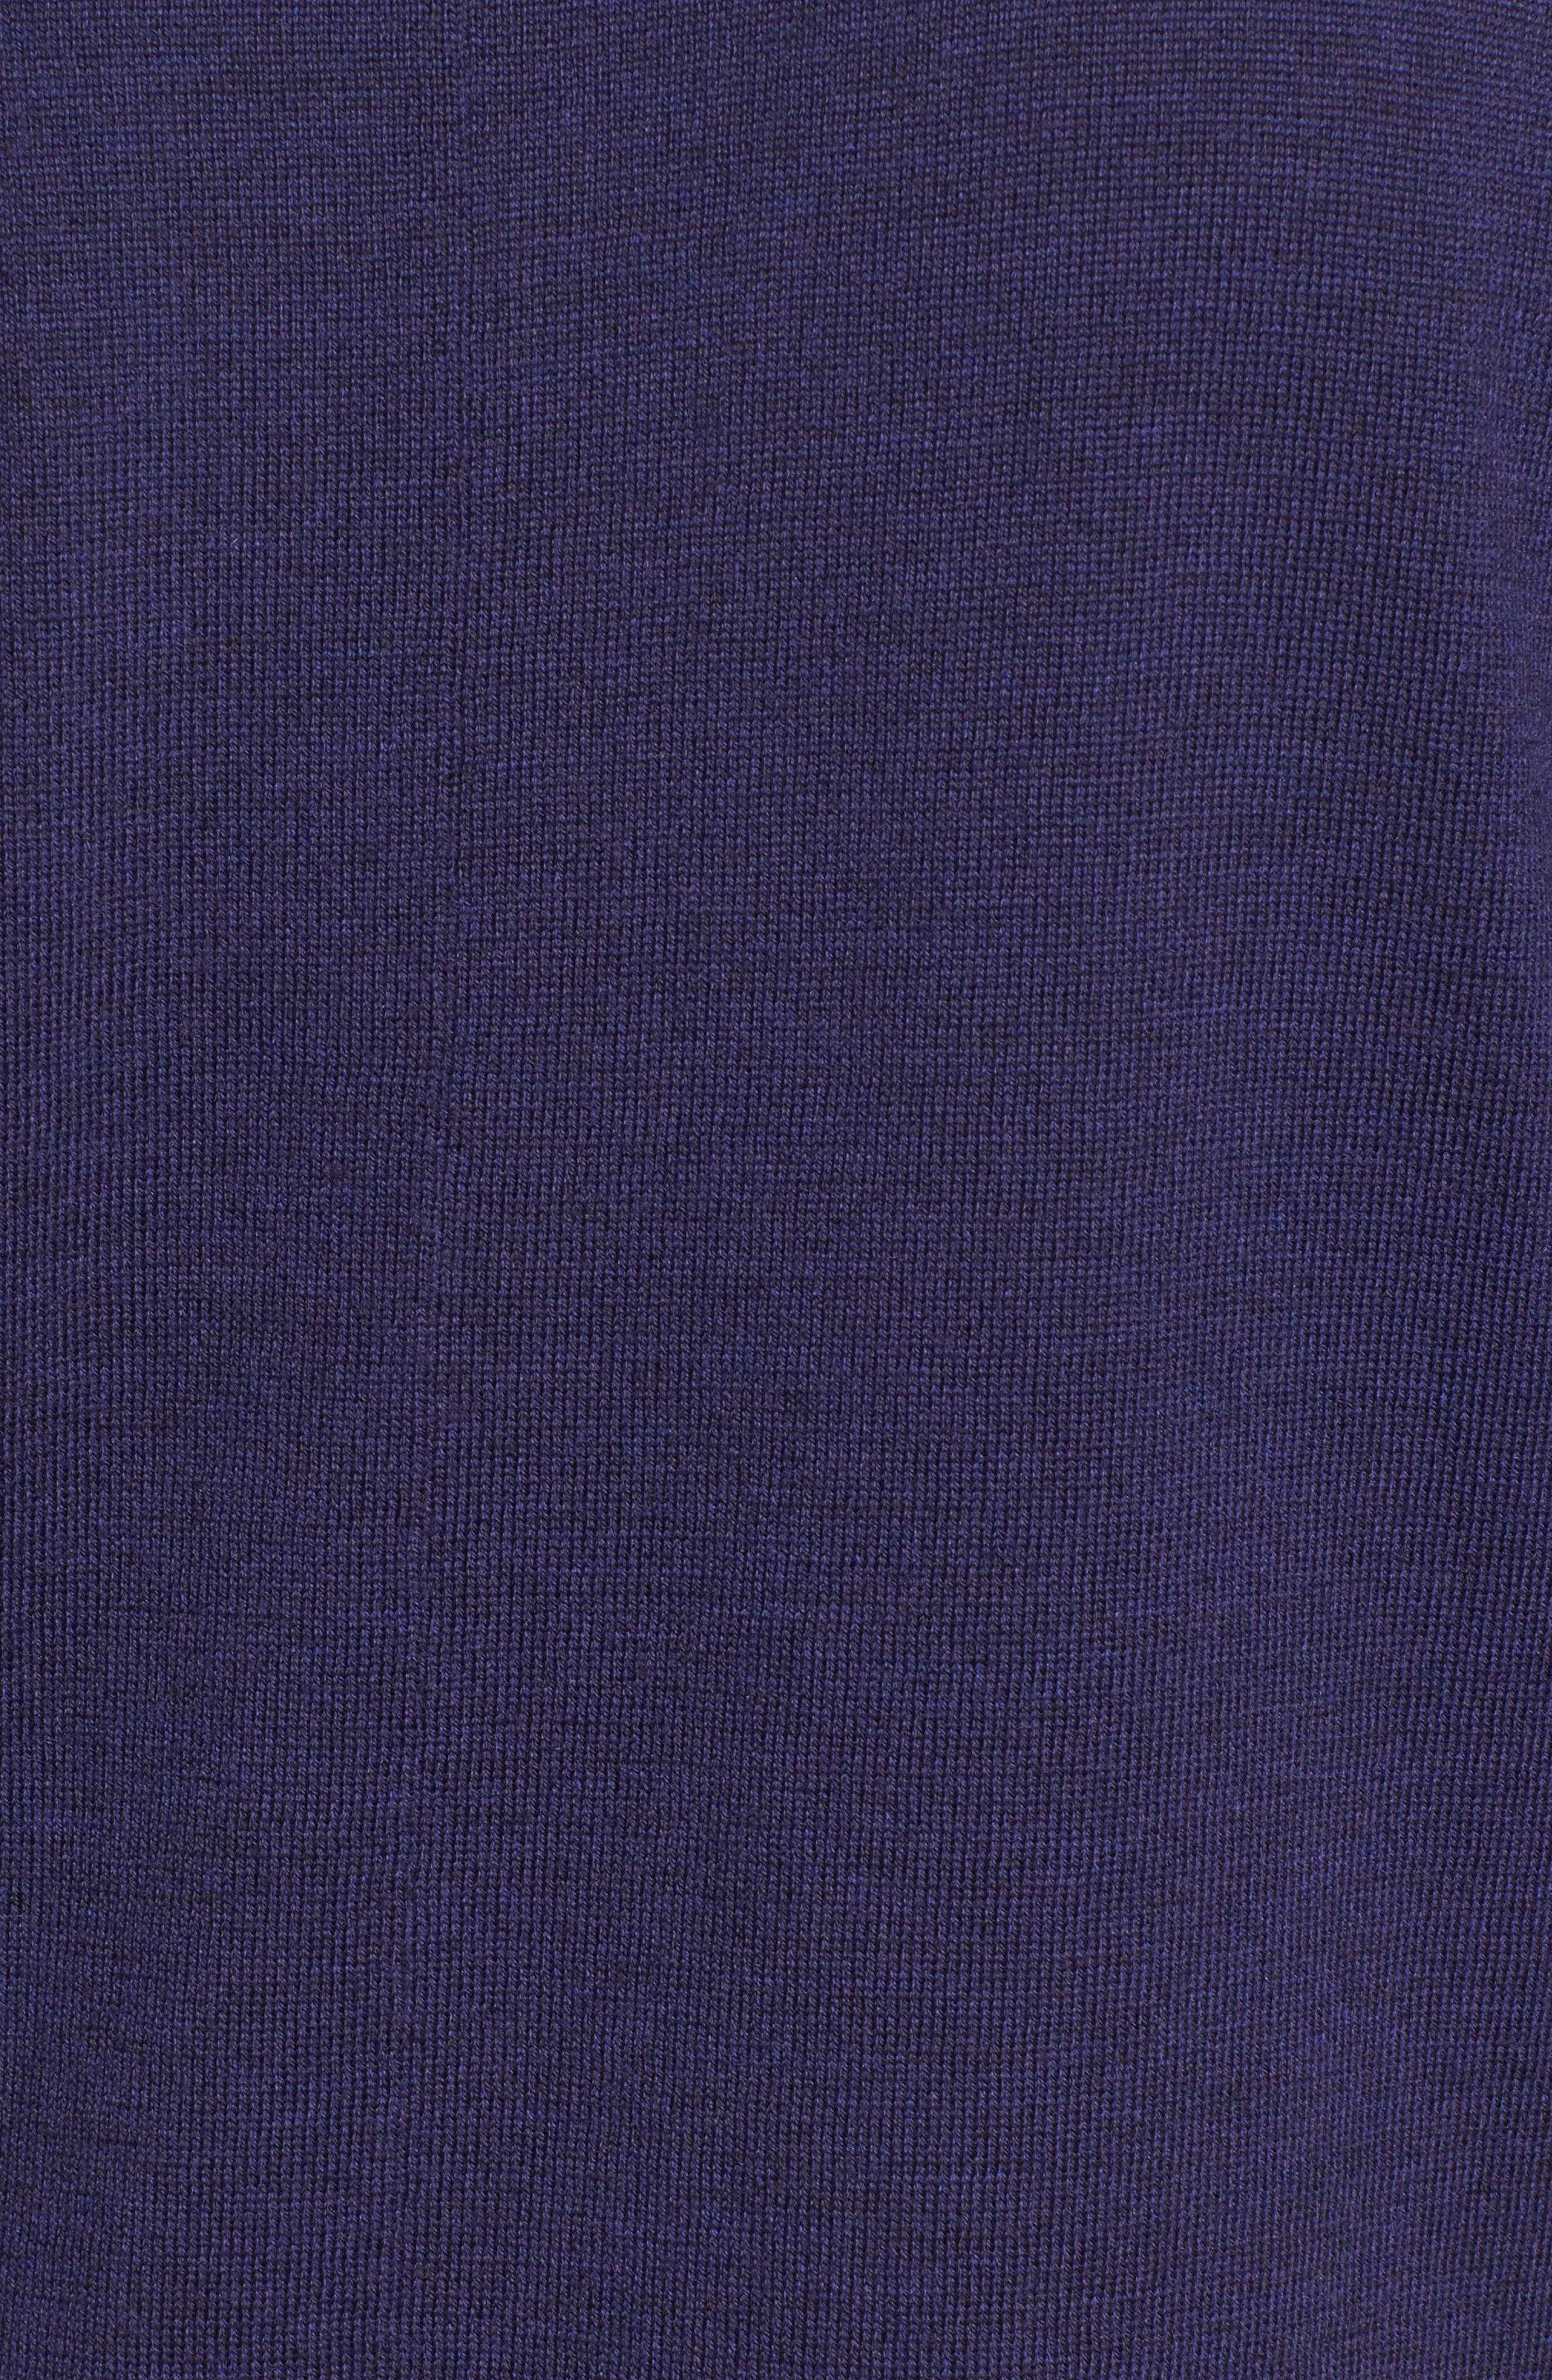 Merino Wool Tunic Sweater,                             Alternate thumbnail 32, color,